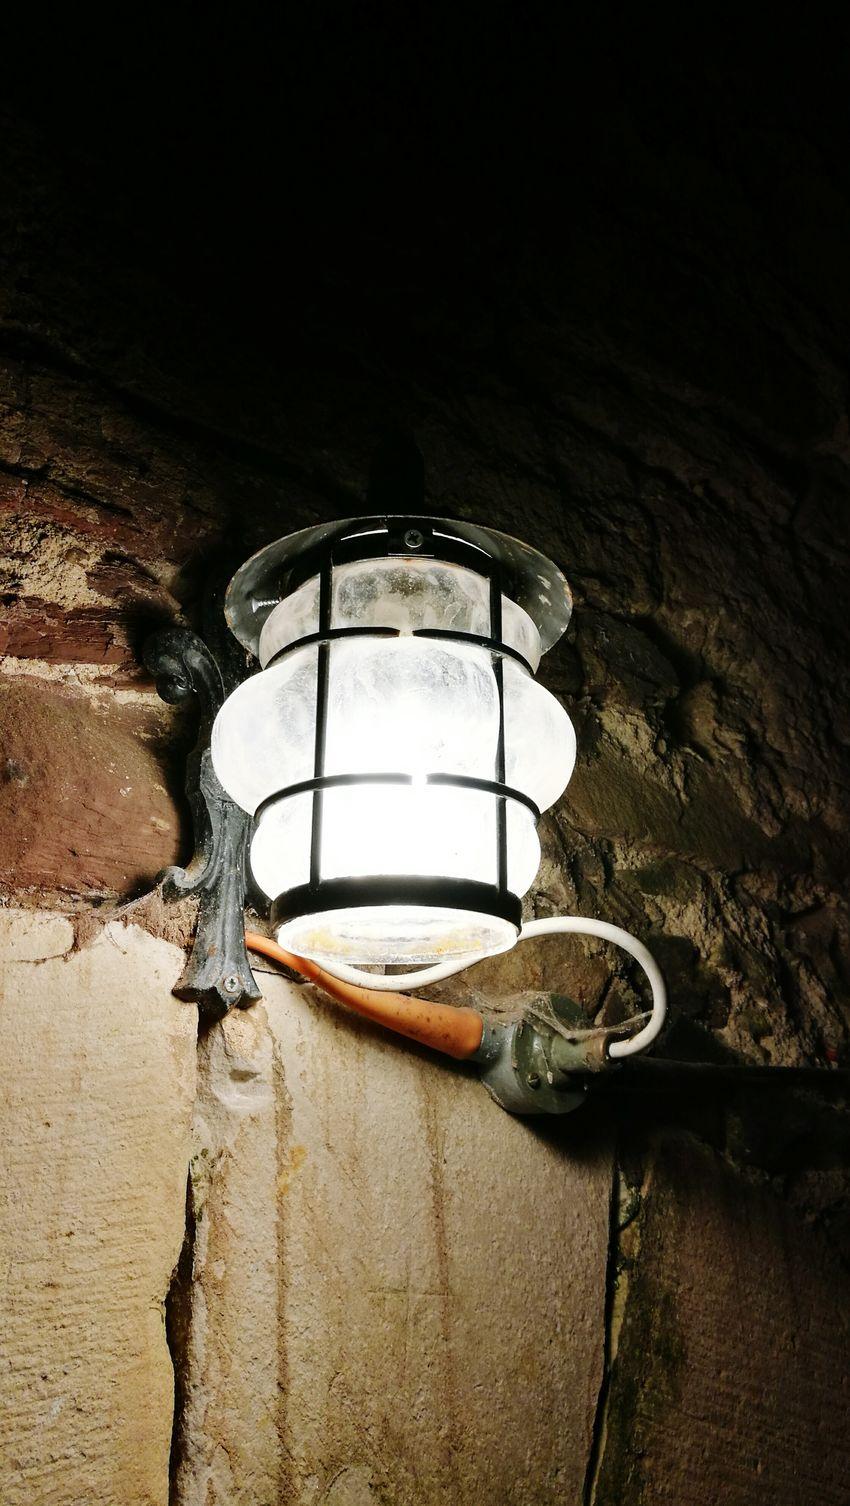 Lighting Equipment Lamp Light And Shadow Castle Wall Castle Light Doune Castle Scotland 💕